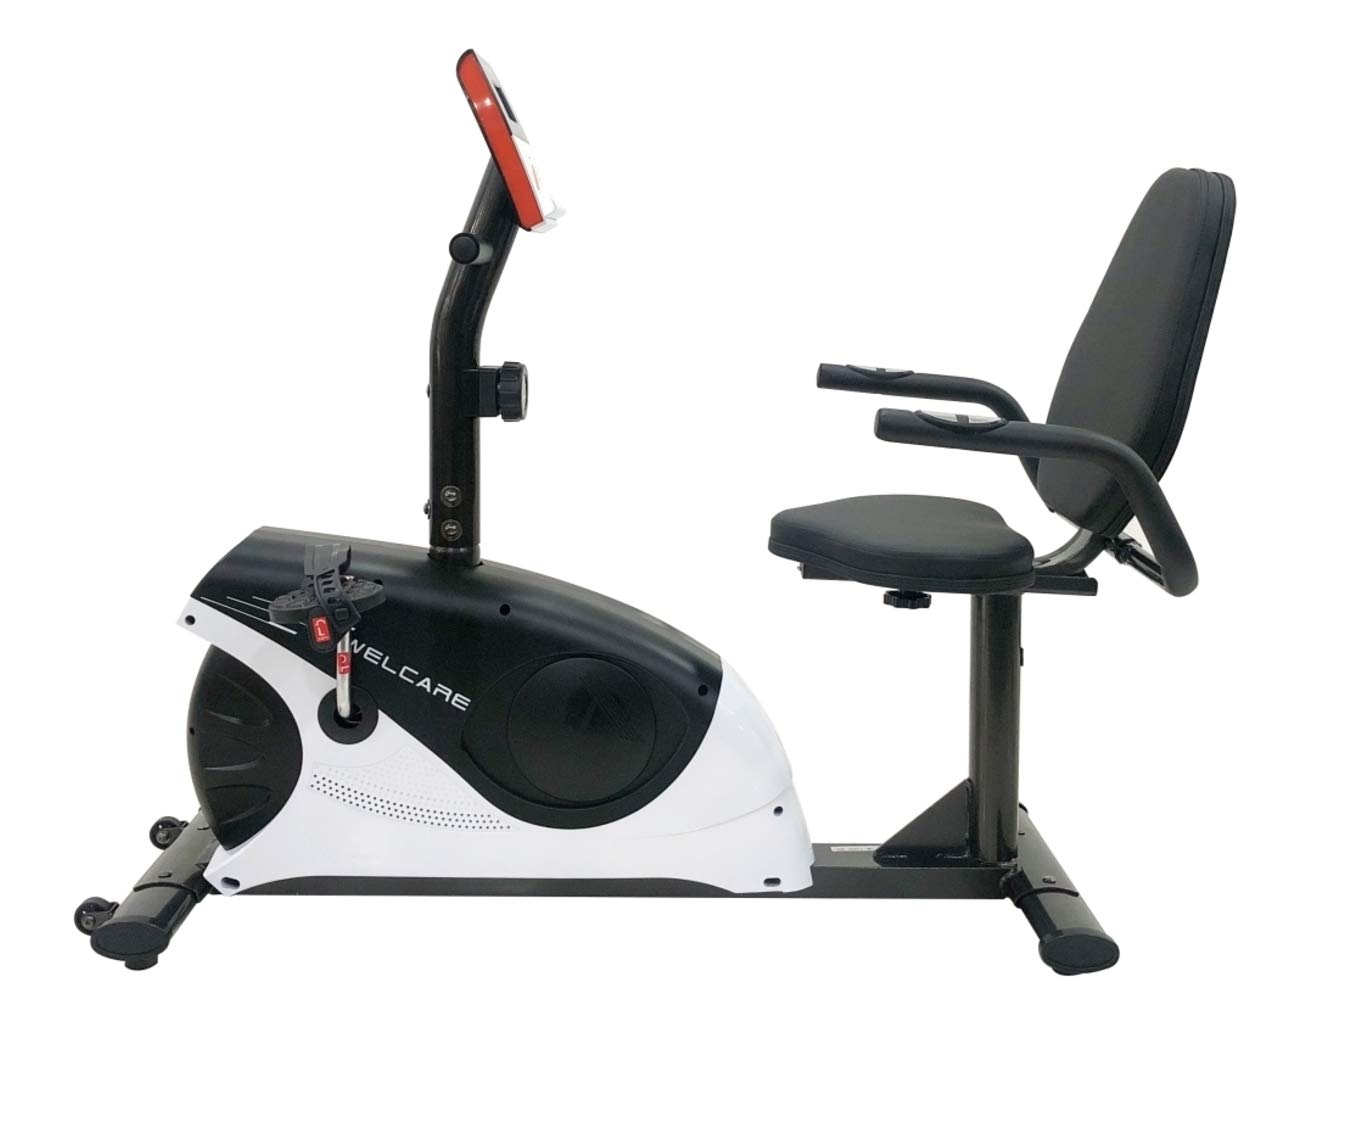 Stationary Portable Pedal Exerciser